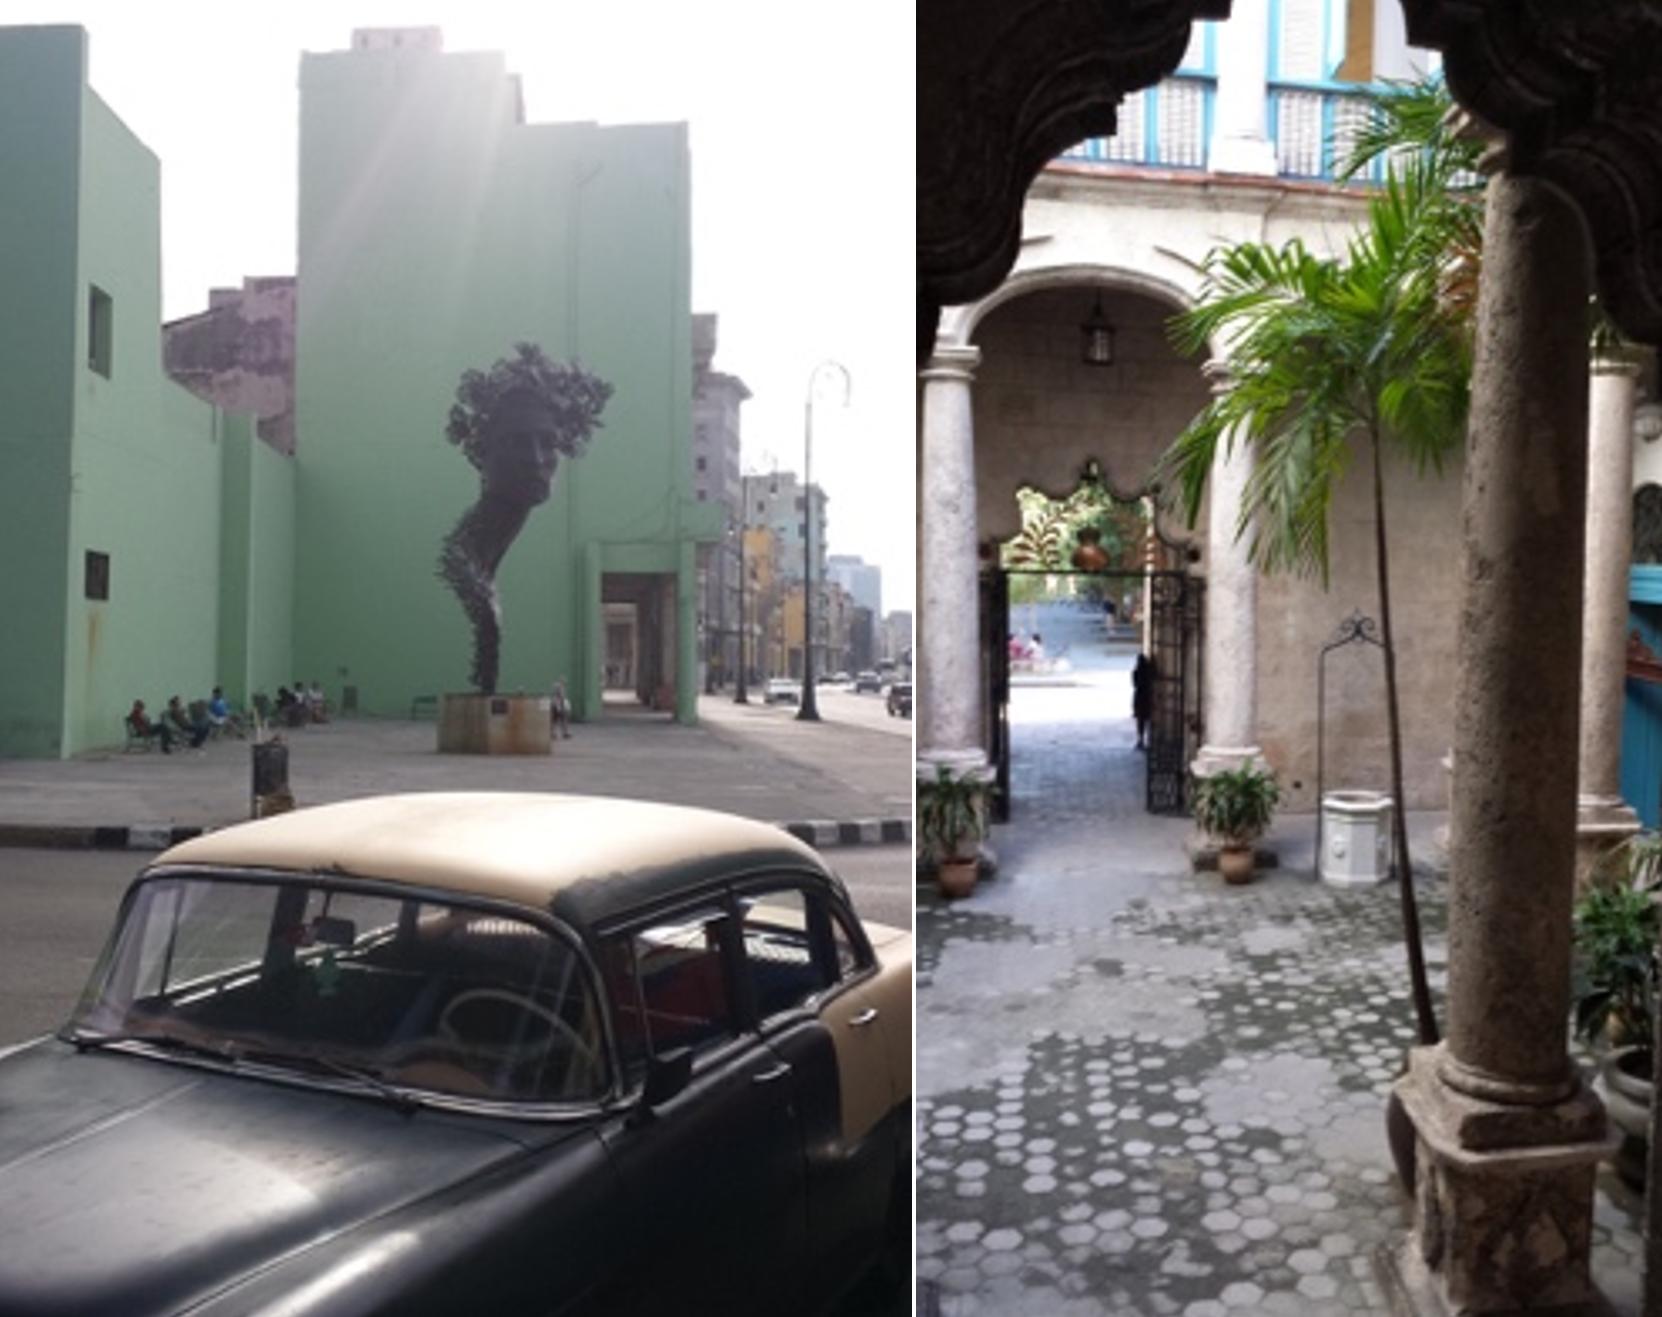 https://fhis.ubc.ca/wp-content/uploads/sites/29/2020/11/Image-Karen-ORegan-Habana-3.png